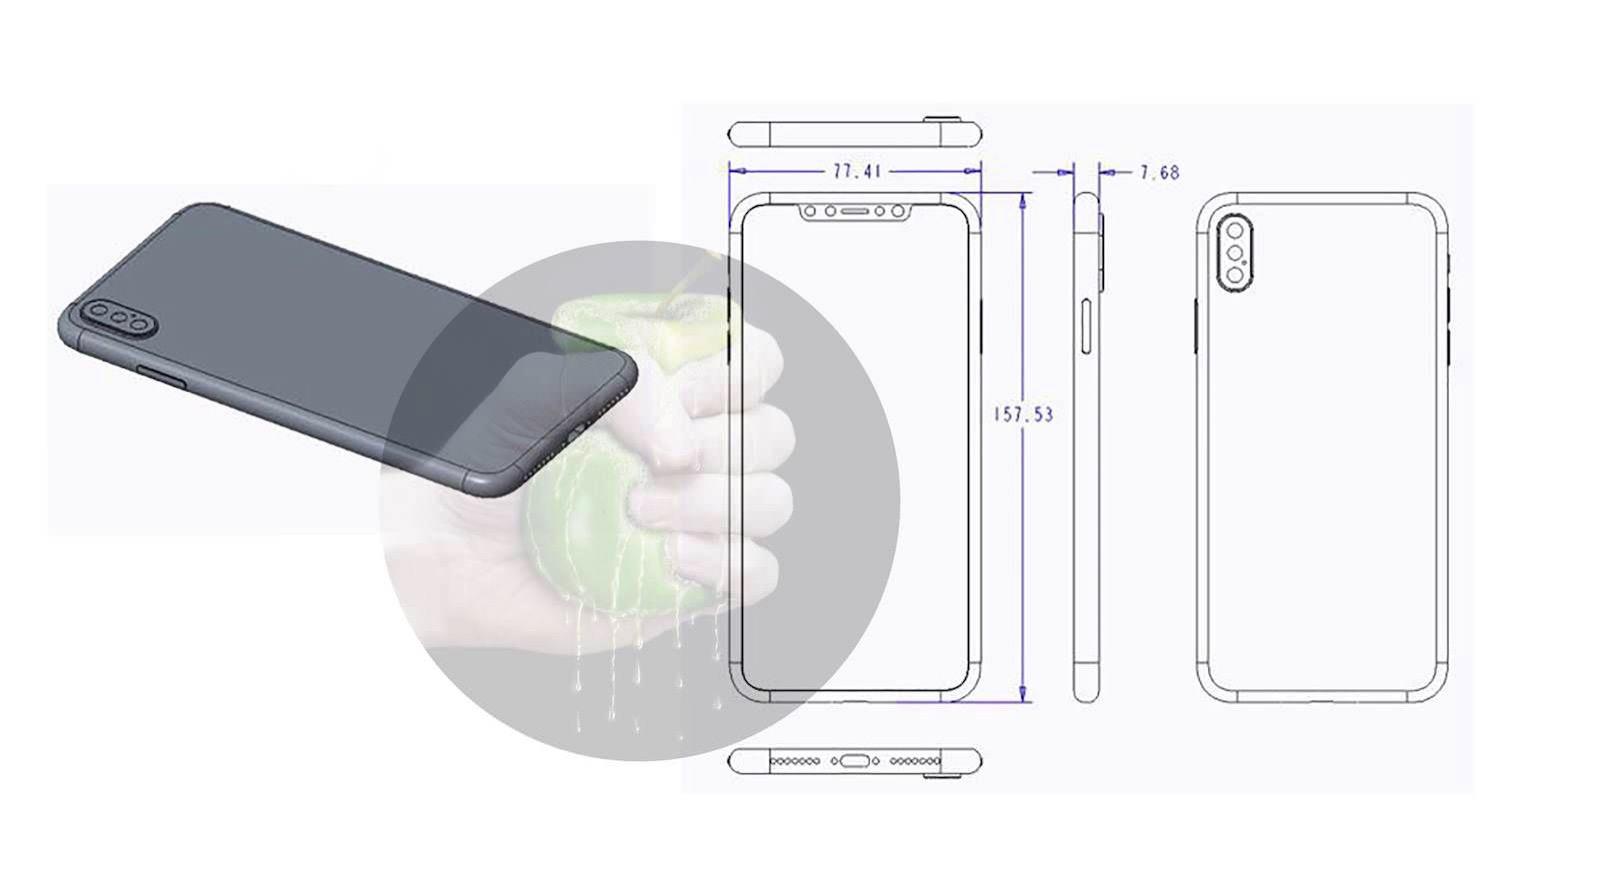 iPhone-9-wylsacom-9.jpg